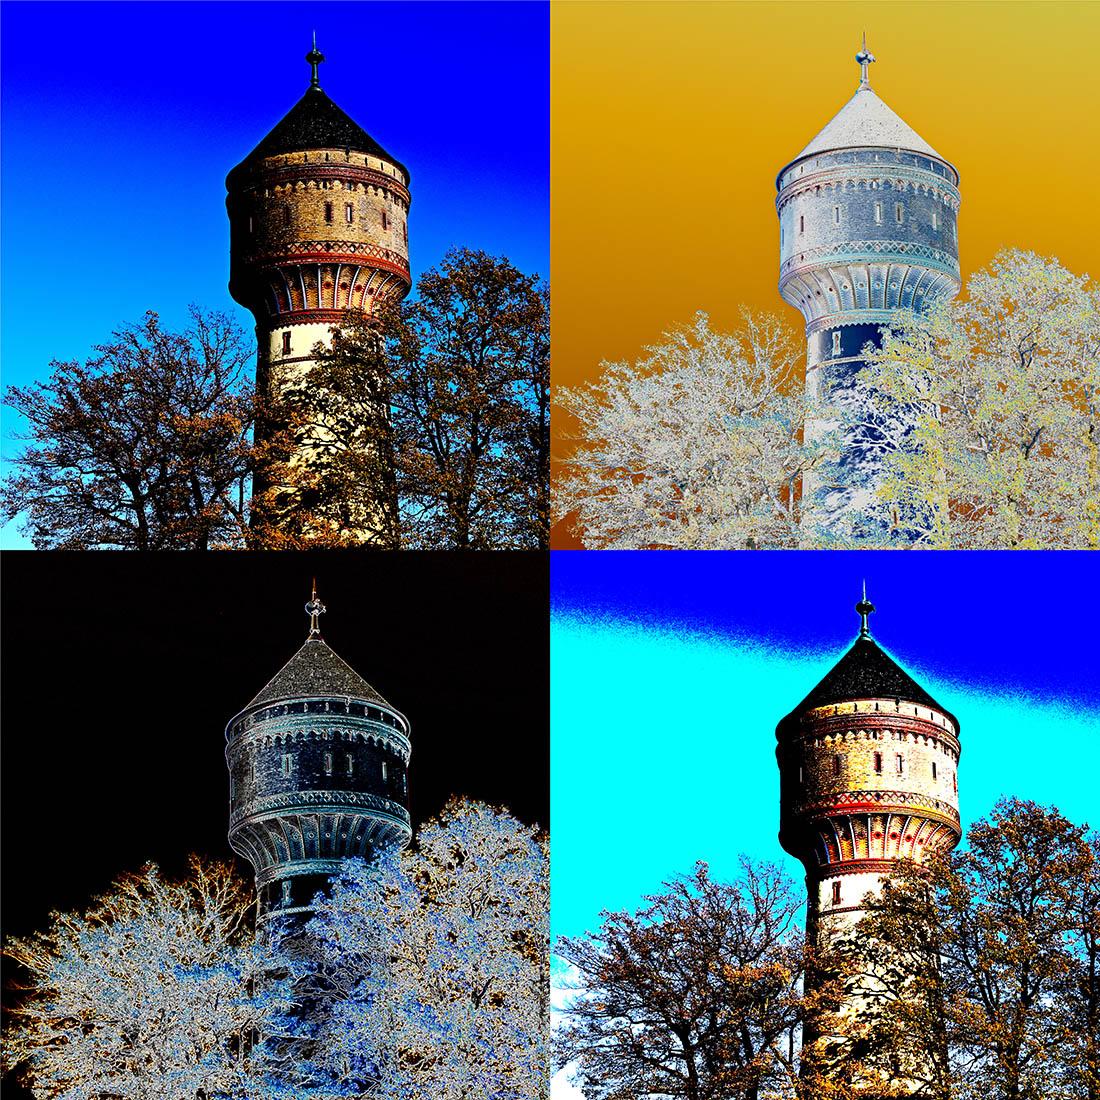 Lippstadt Wasserturm 1